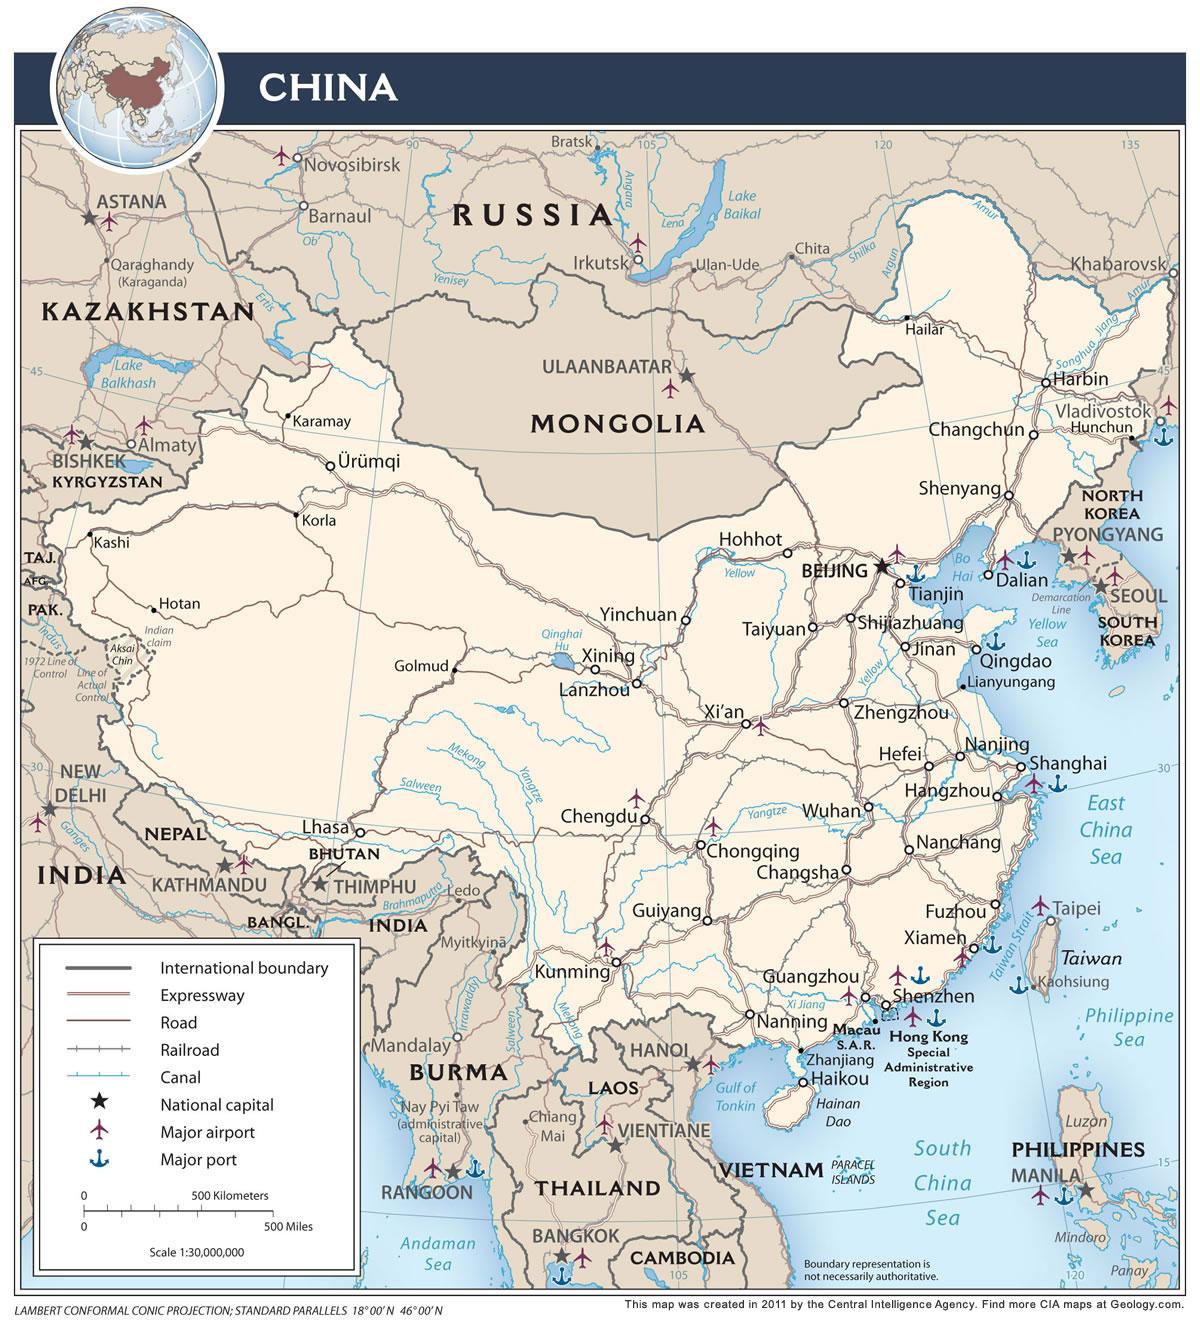 China Map And Satellite Image